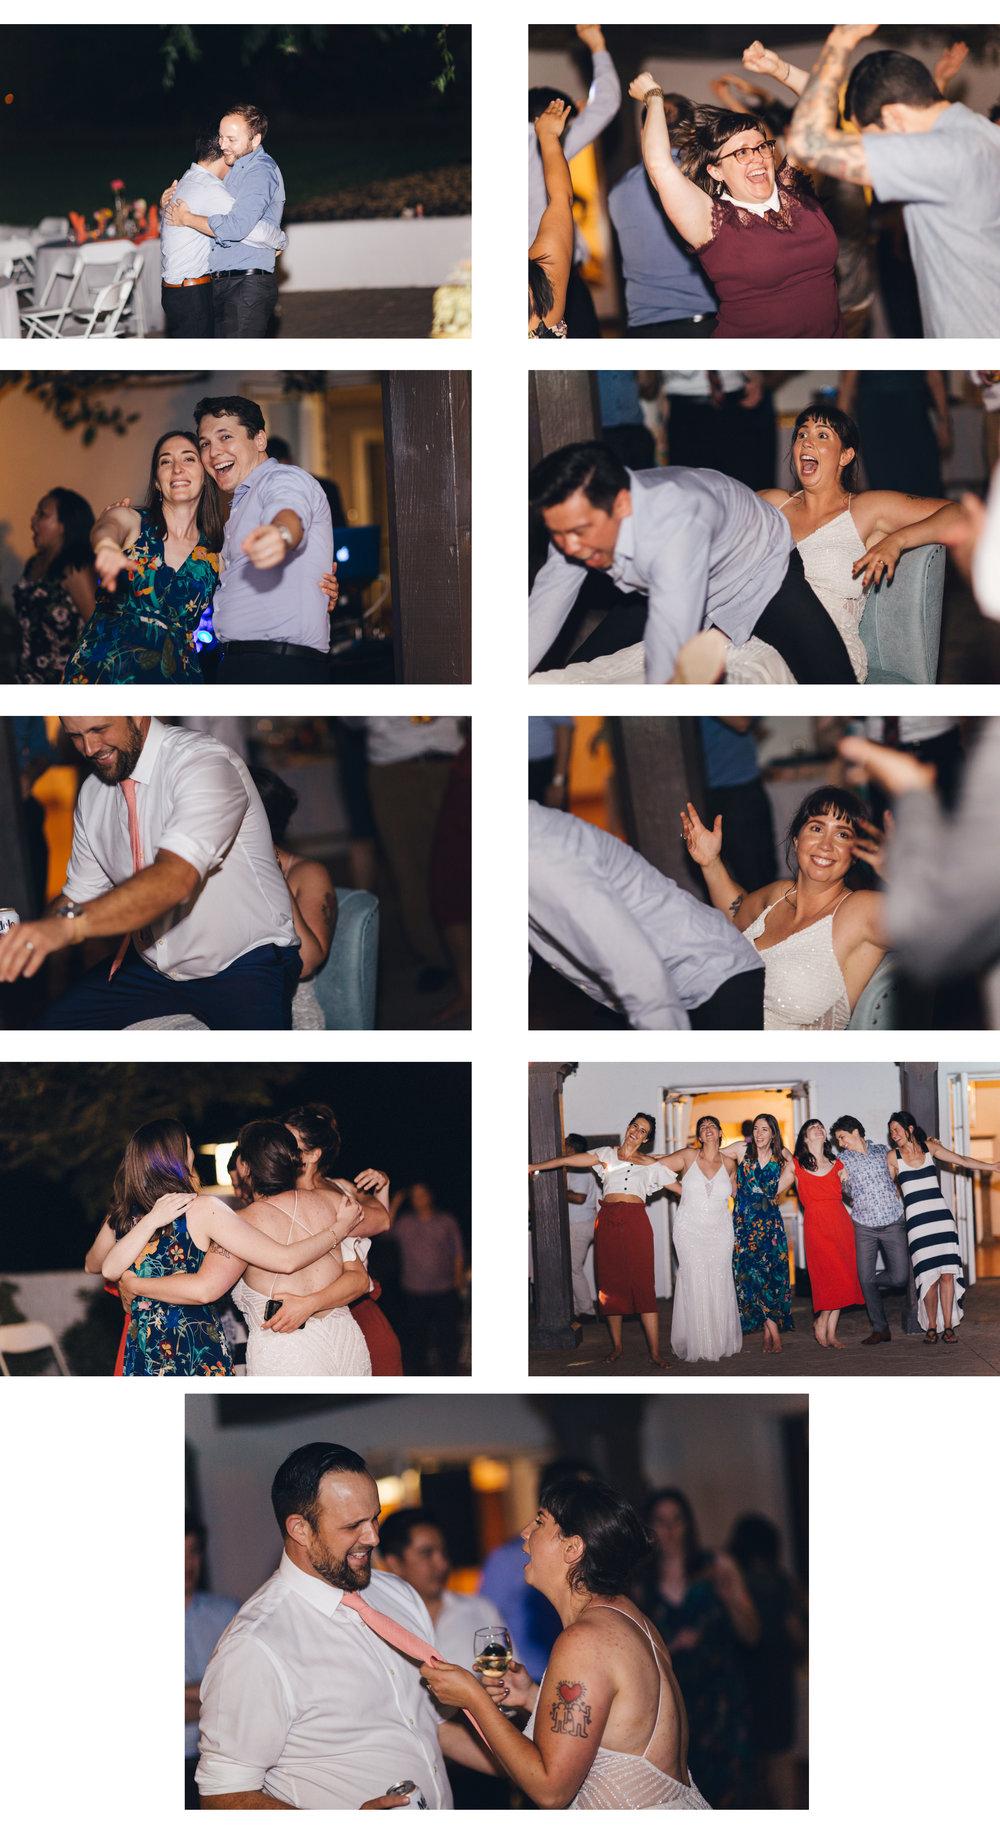 IG_wedding (103 of 110) copy.jpg